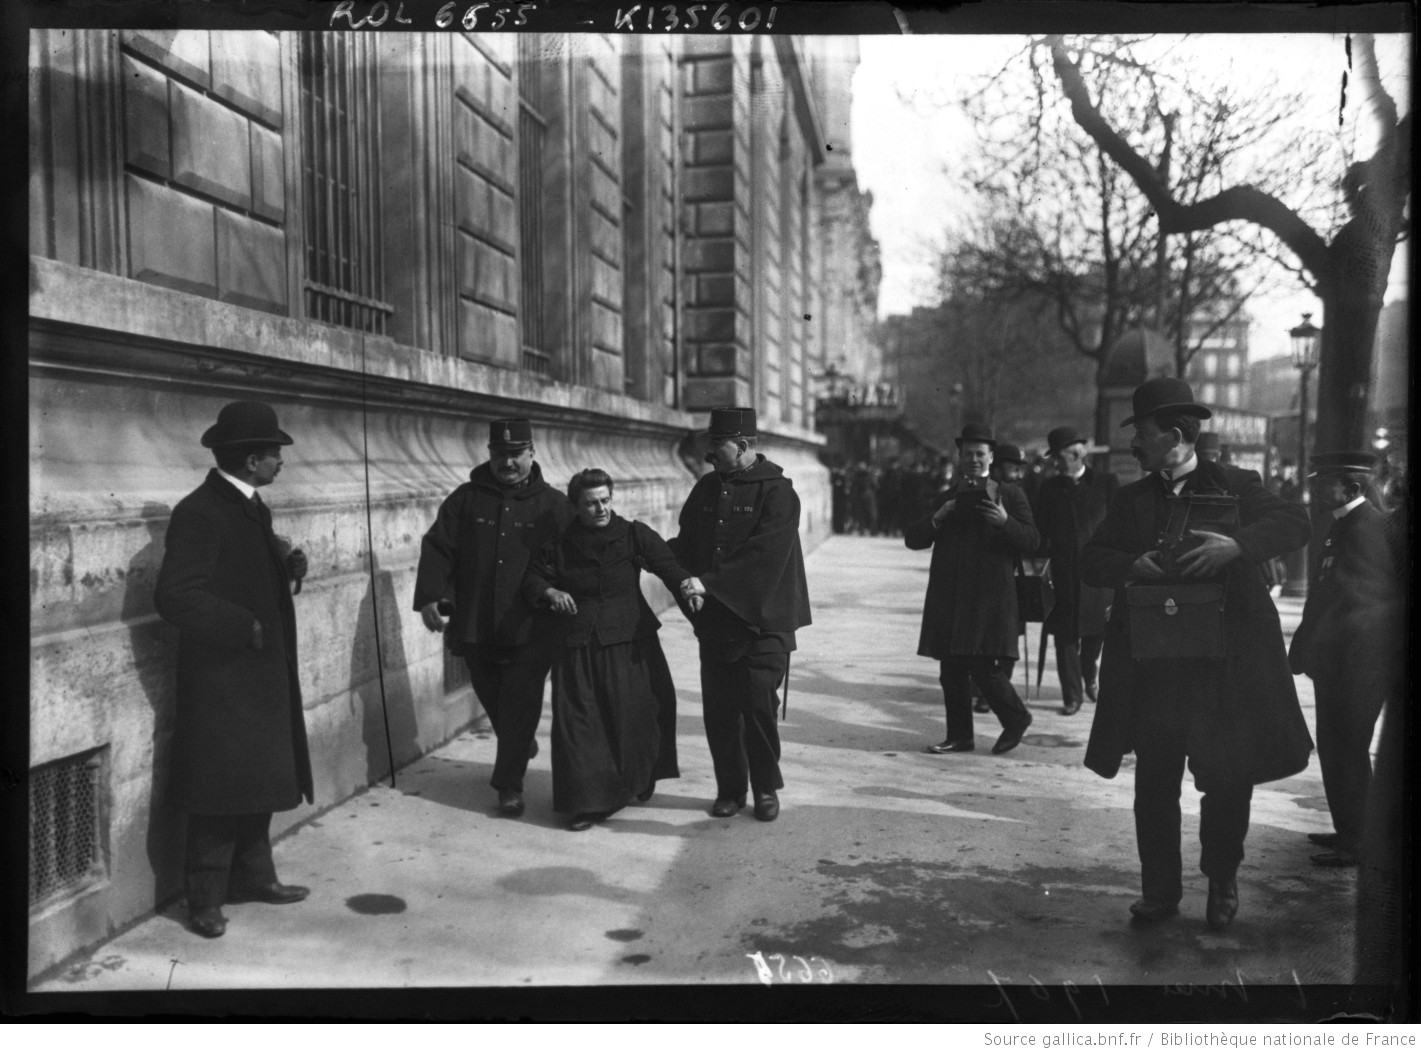 1er Mai 1907 [arrestation d'une femme] : [photographie de presse] / [Agence Rol]